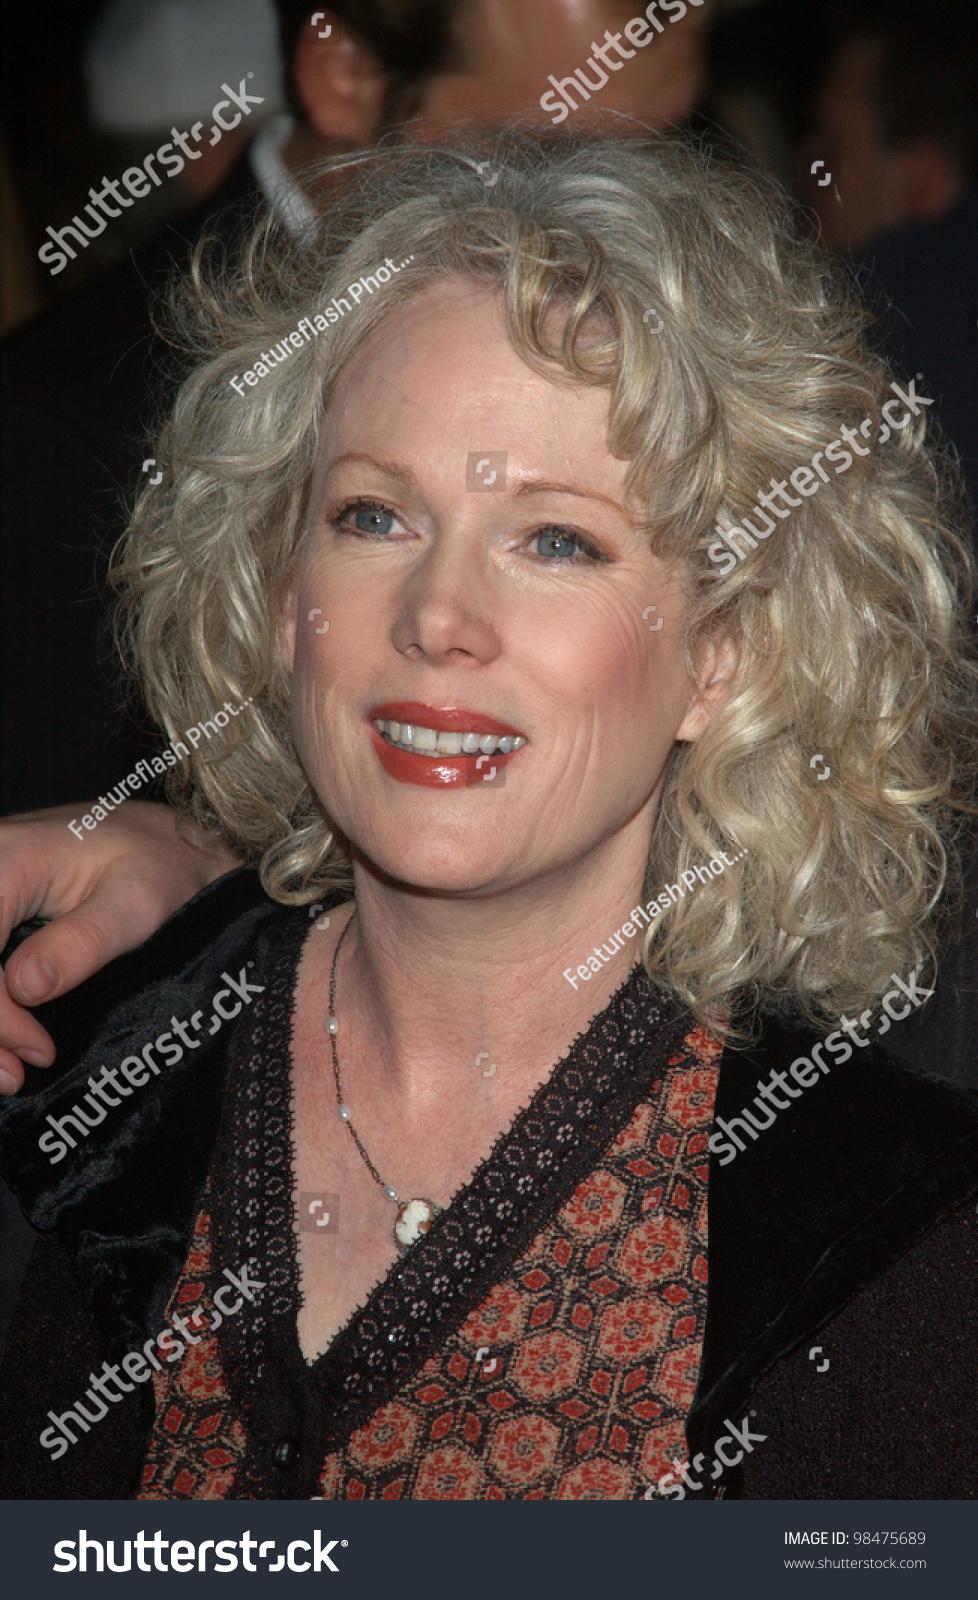 Hillary Wolf,Sheila Terry (actress) Hot pics Annette Crosbie (born 1934),Rosanne Katon